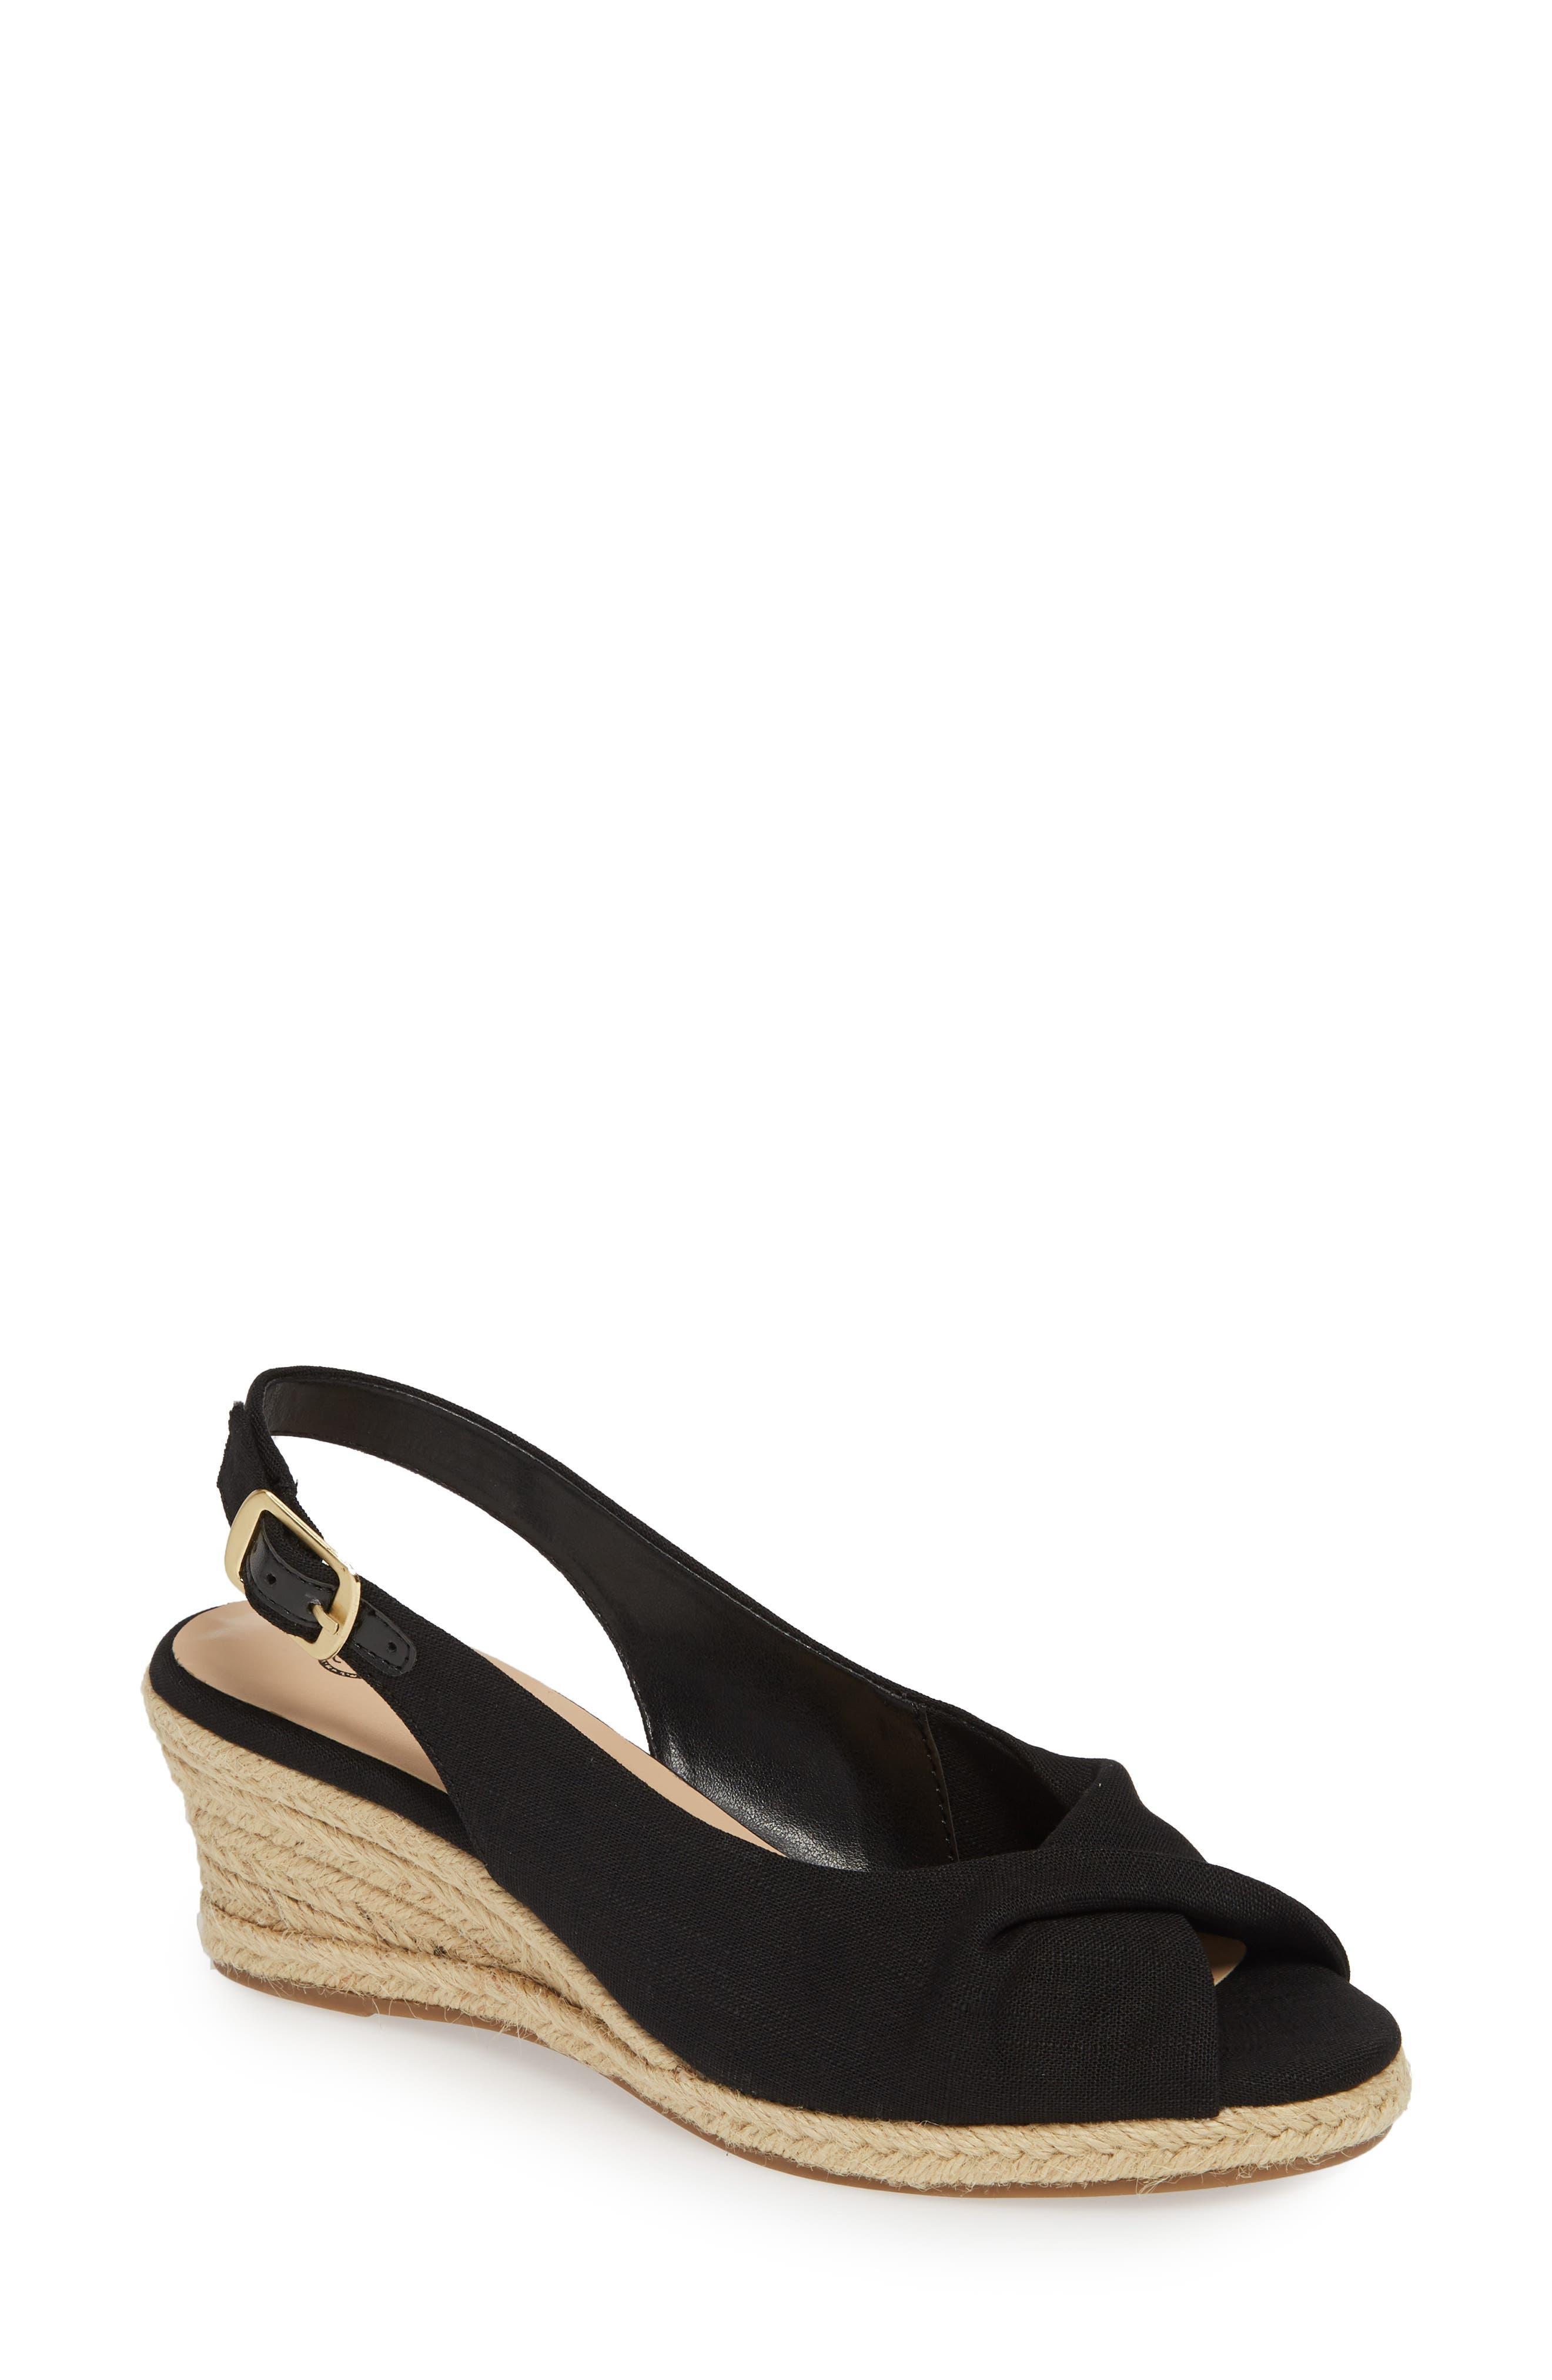 BELLA VITA Sylvie II Espadrille Wedge Sandal, Main, color, BLACK LINEN